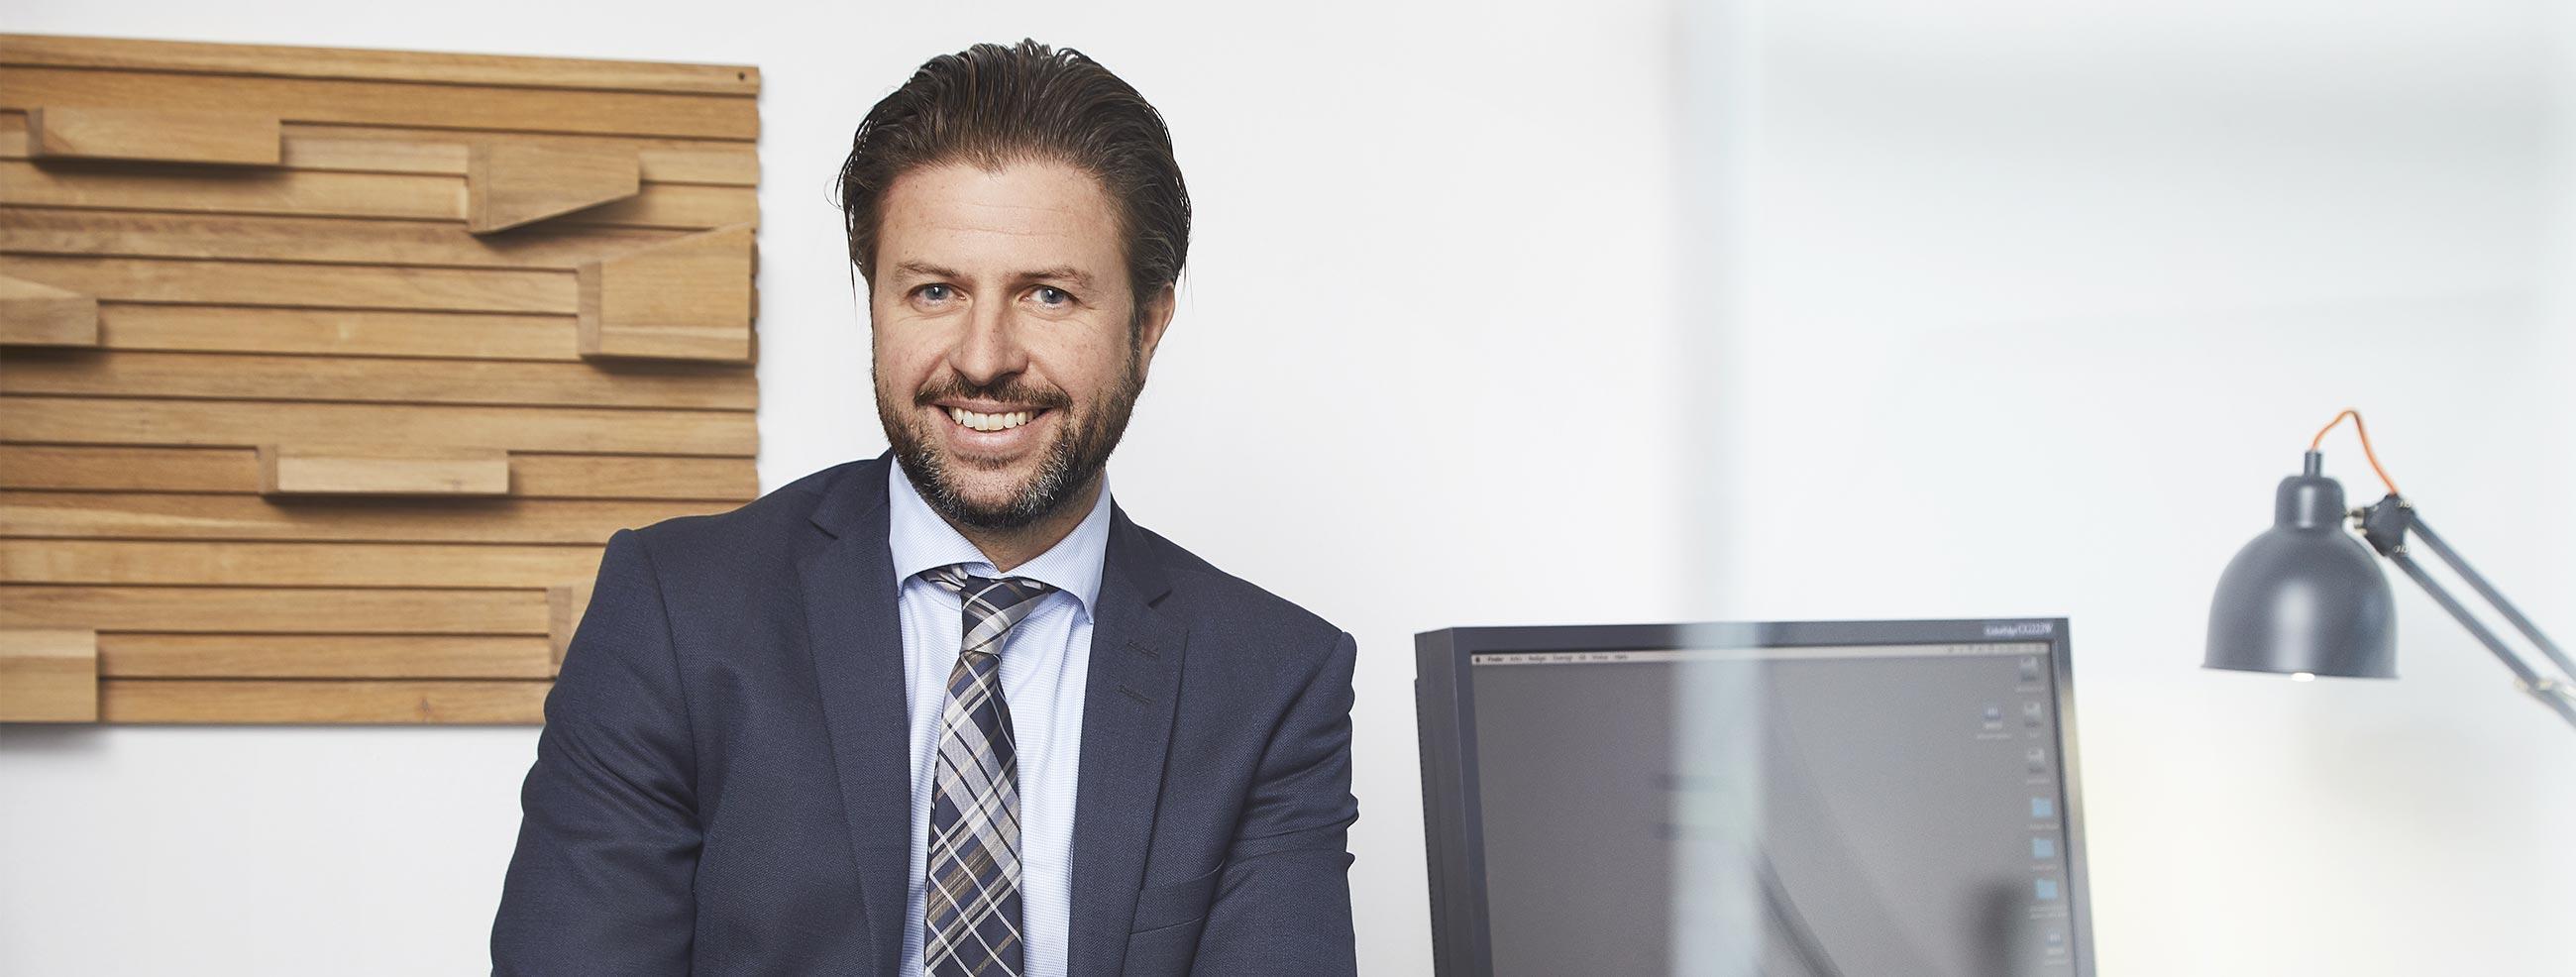 Anders Birch Poulsen Advokat Arbejdsret advokatgruppen